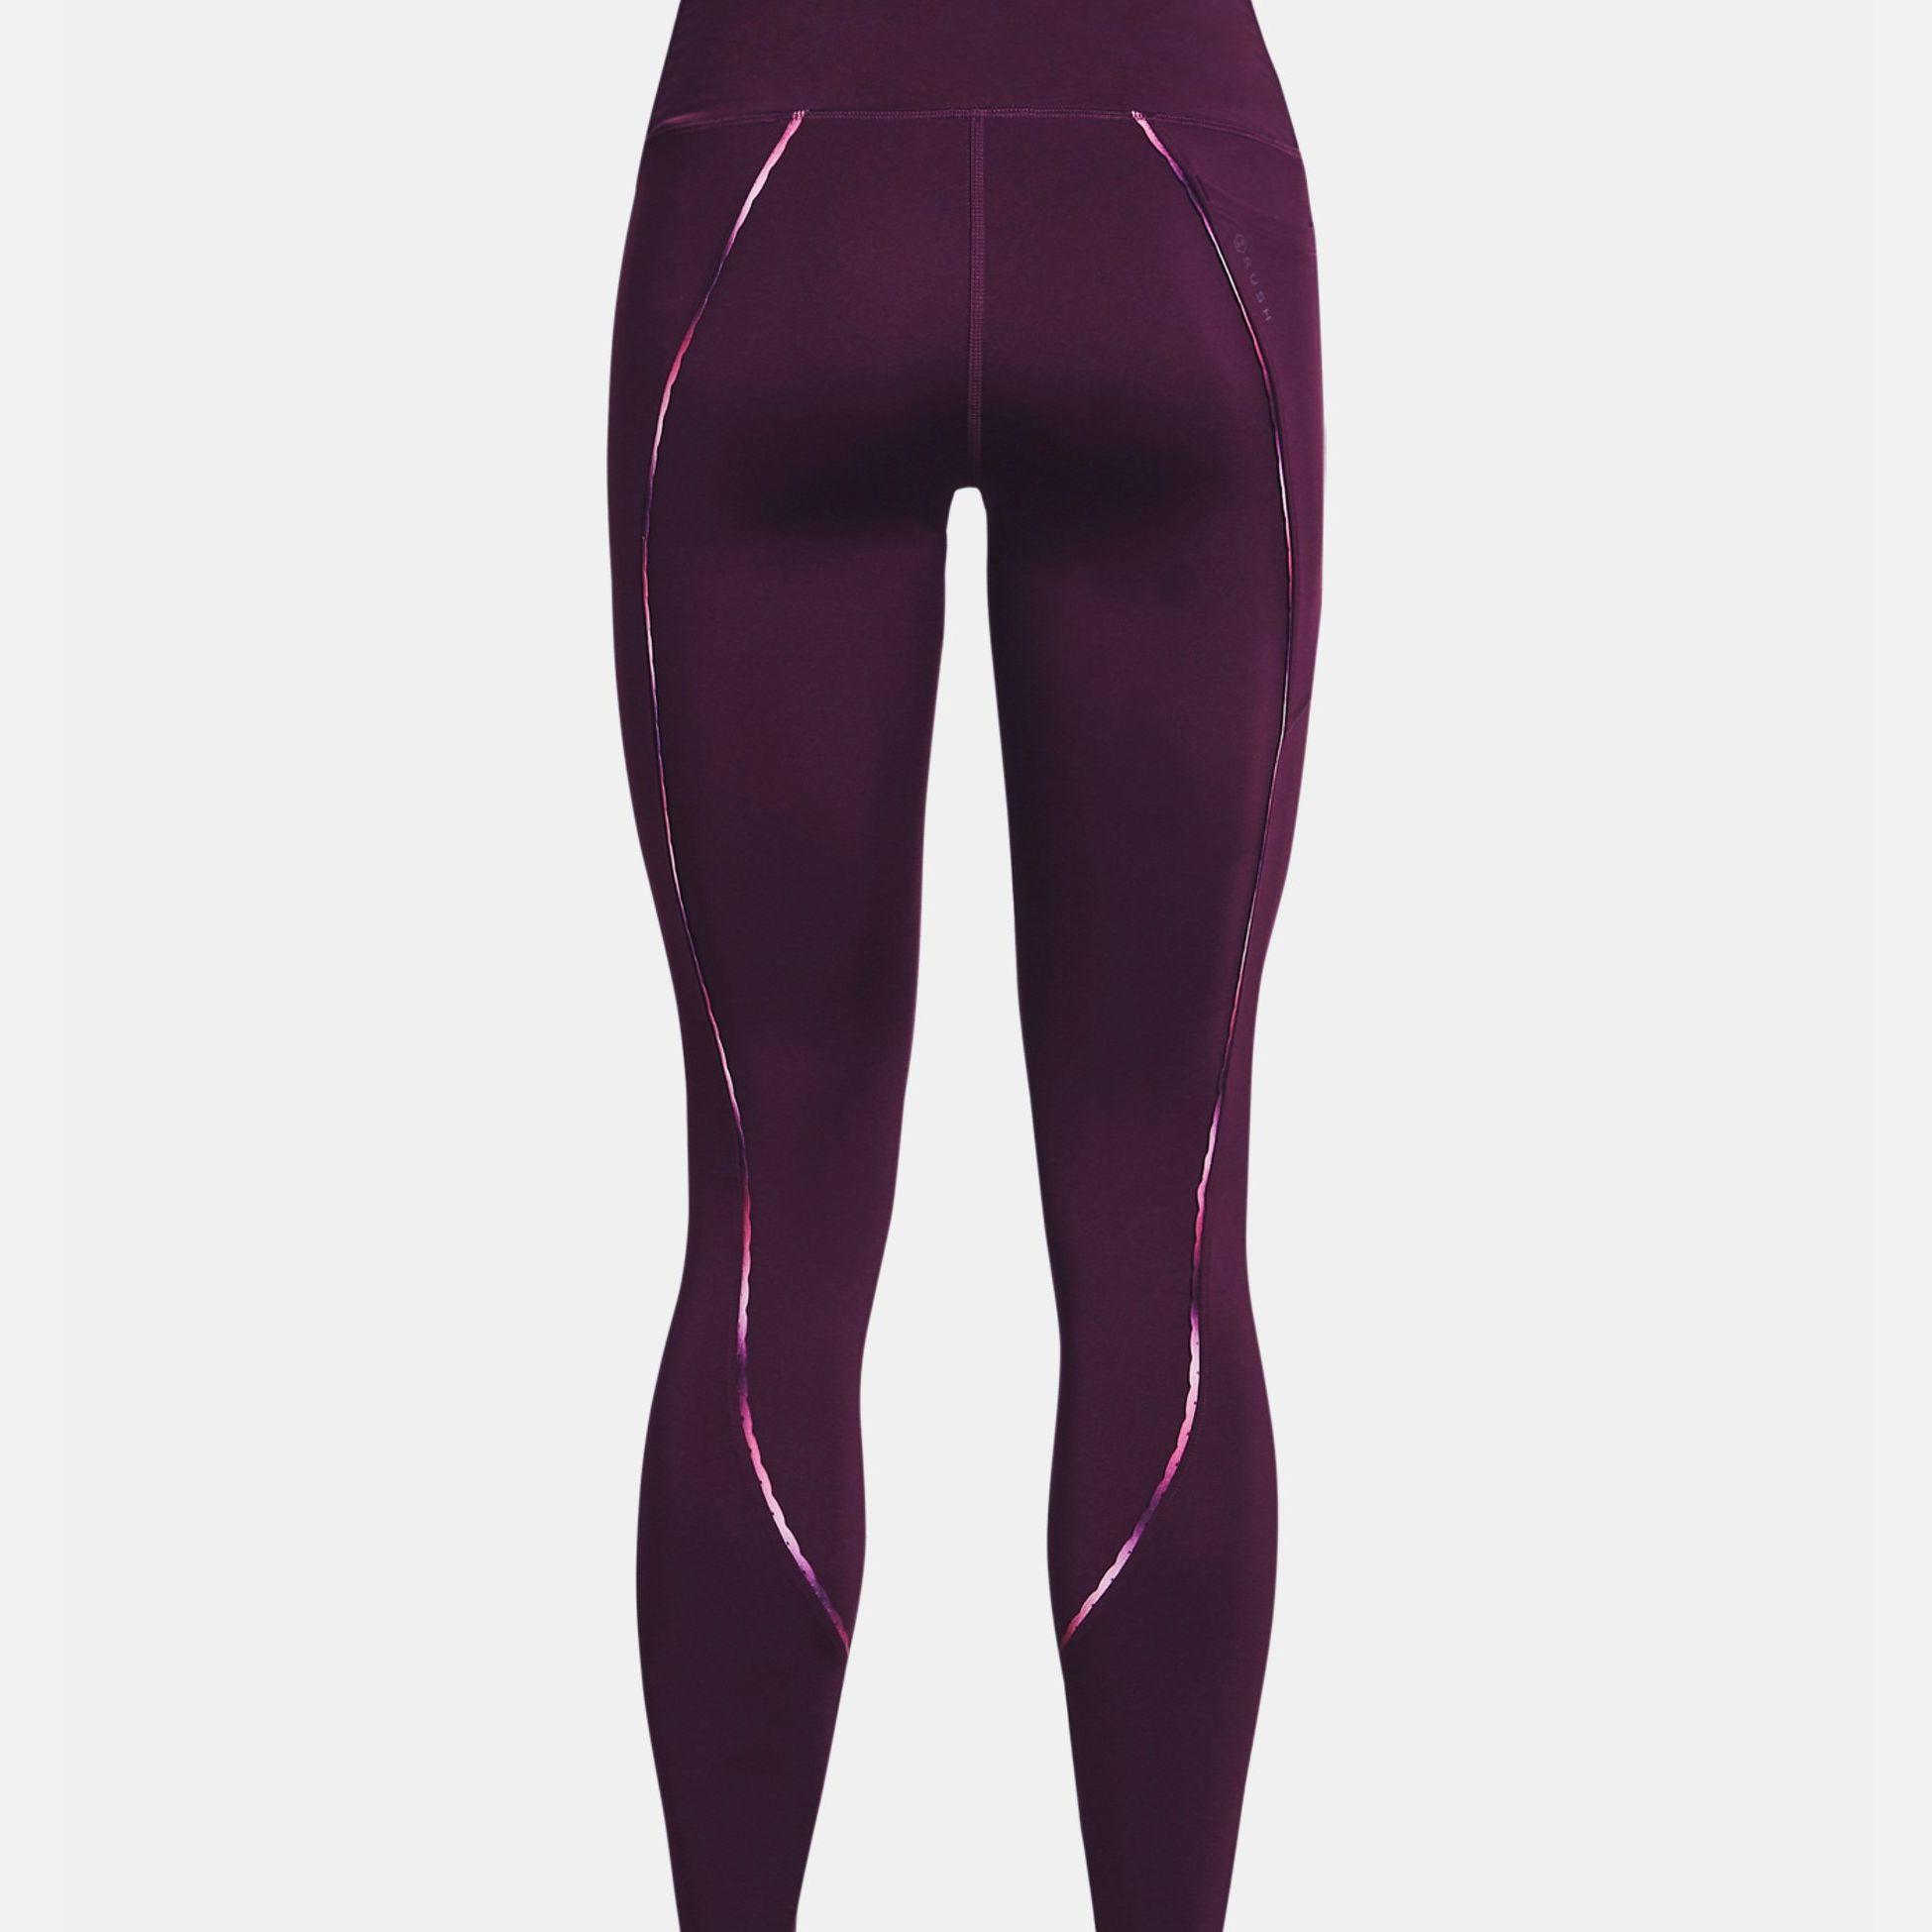 Îmbrăcăminte -  under armour UA RUSH No-Slip Waistband Scallop Leggings 5355